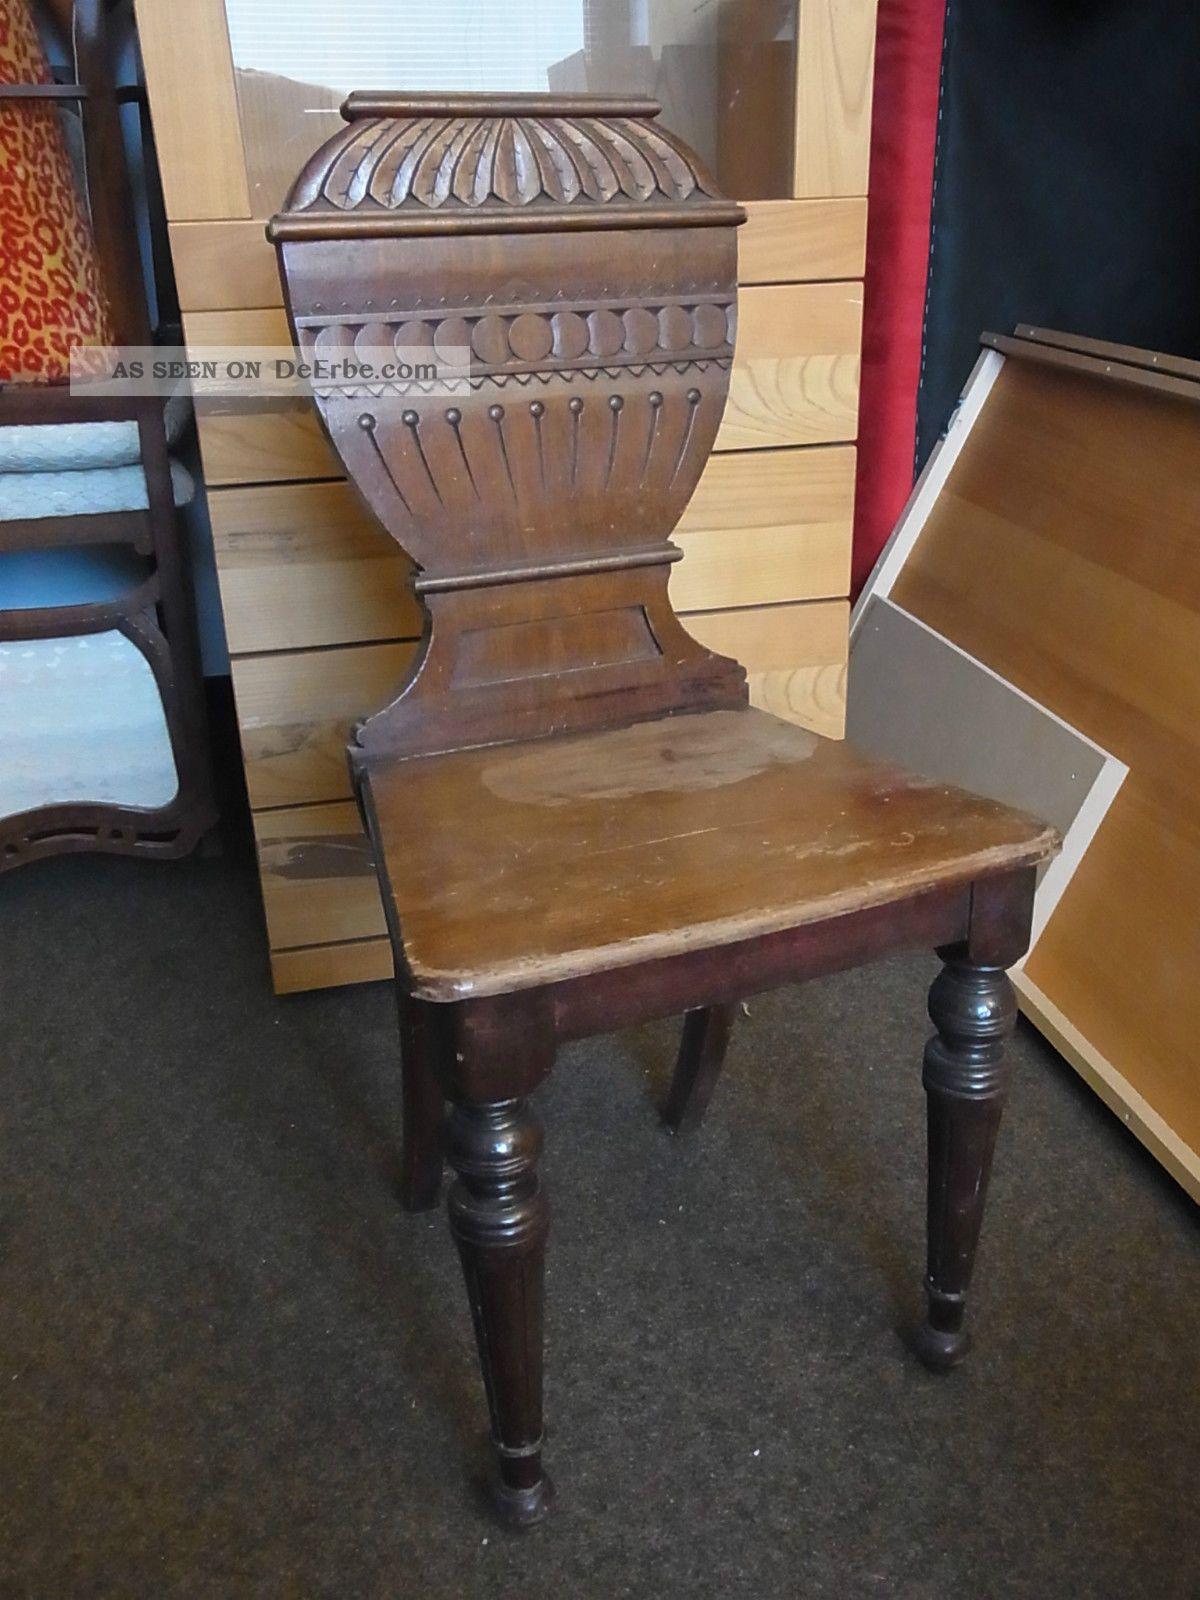 holz stuhl antik massiv geschnitzt lehne loft shabby. Black Bedroom Furniture Sets. Home Design Ideas